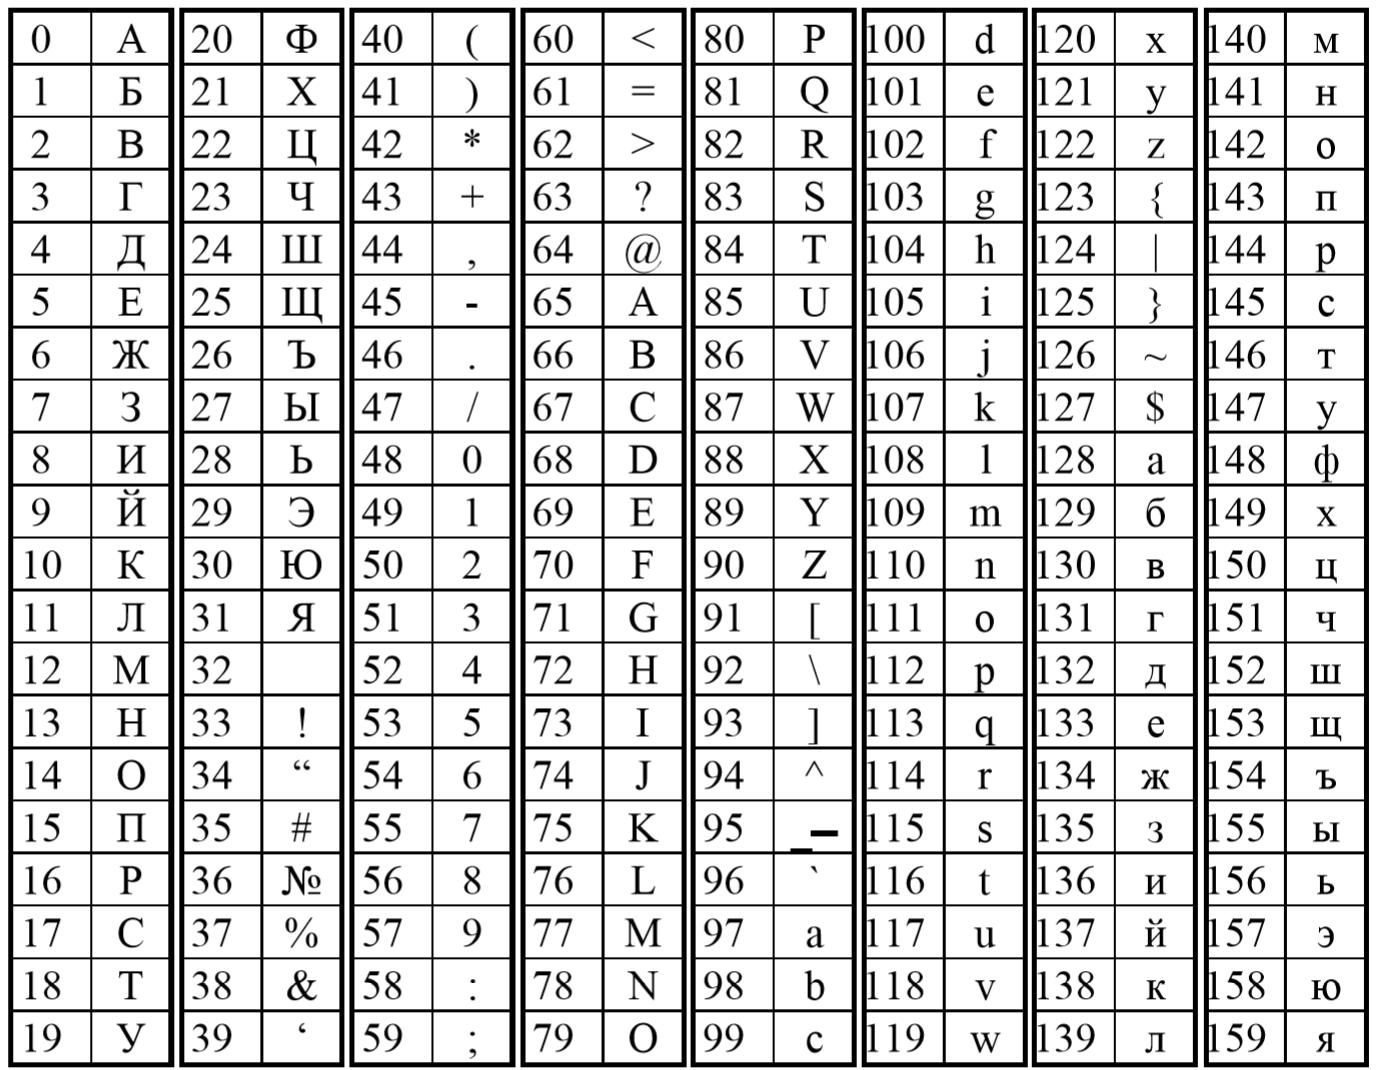 Таблица символов Элвес МФ